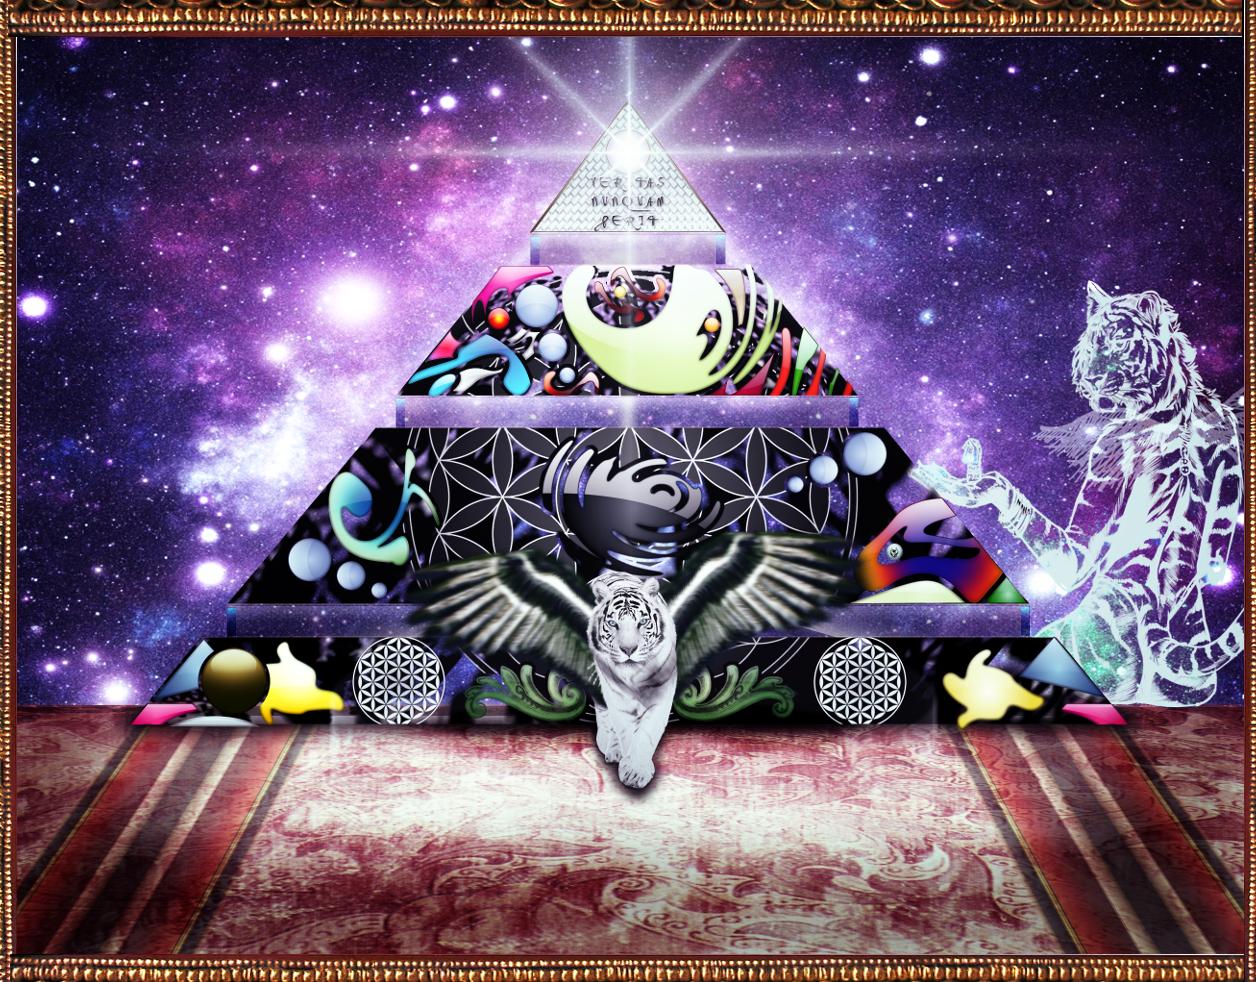 Great Death Conquering III by Reyes-Ricardo